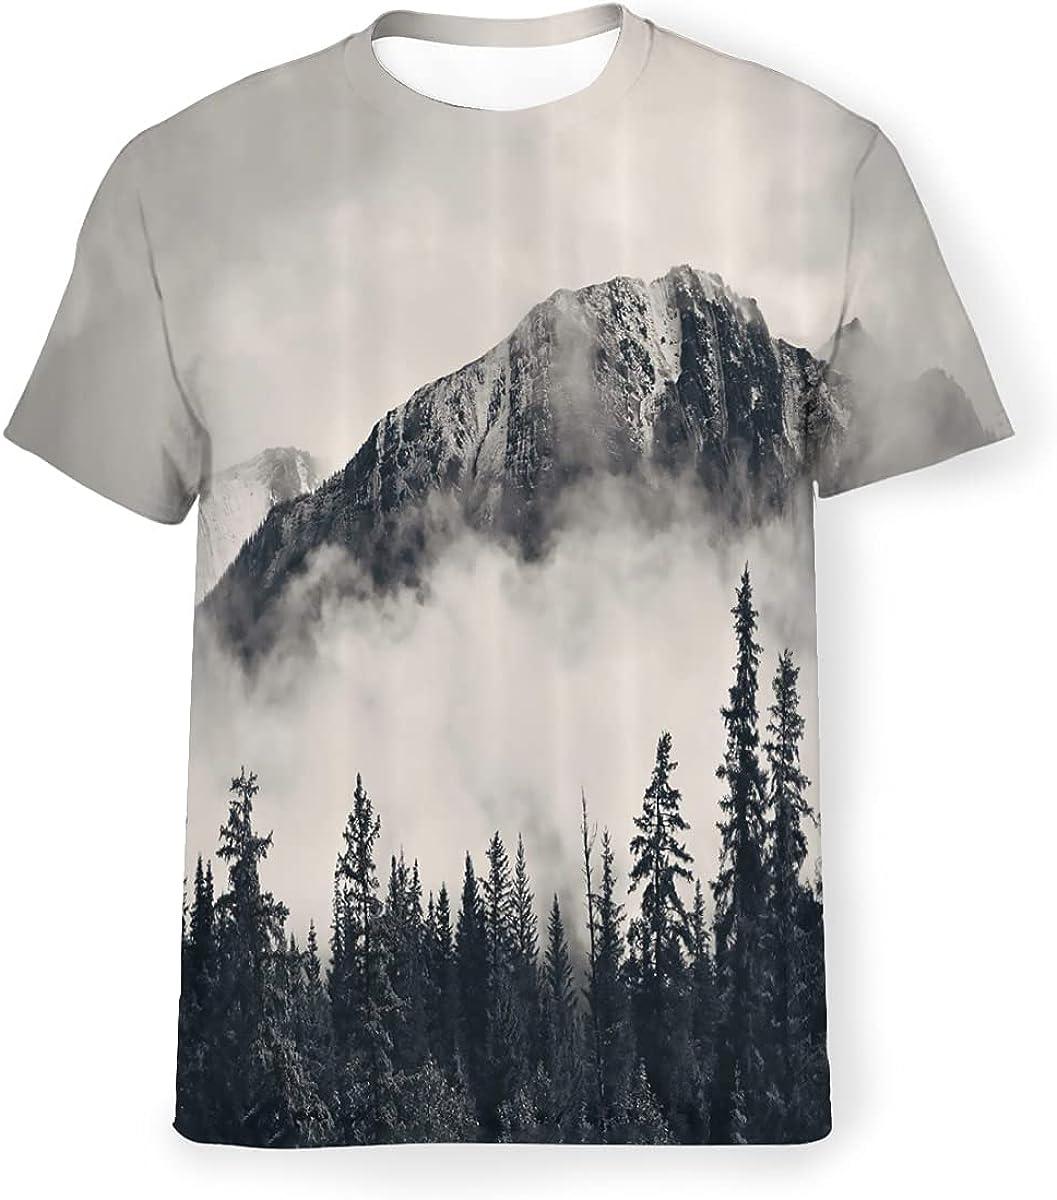 gtdvnyi Summer Men T-Shirts 3D Printing Crewneck Short Sleeve Hawaiian Holiday Top Tees